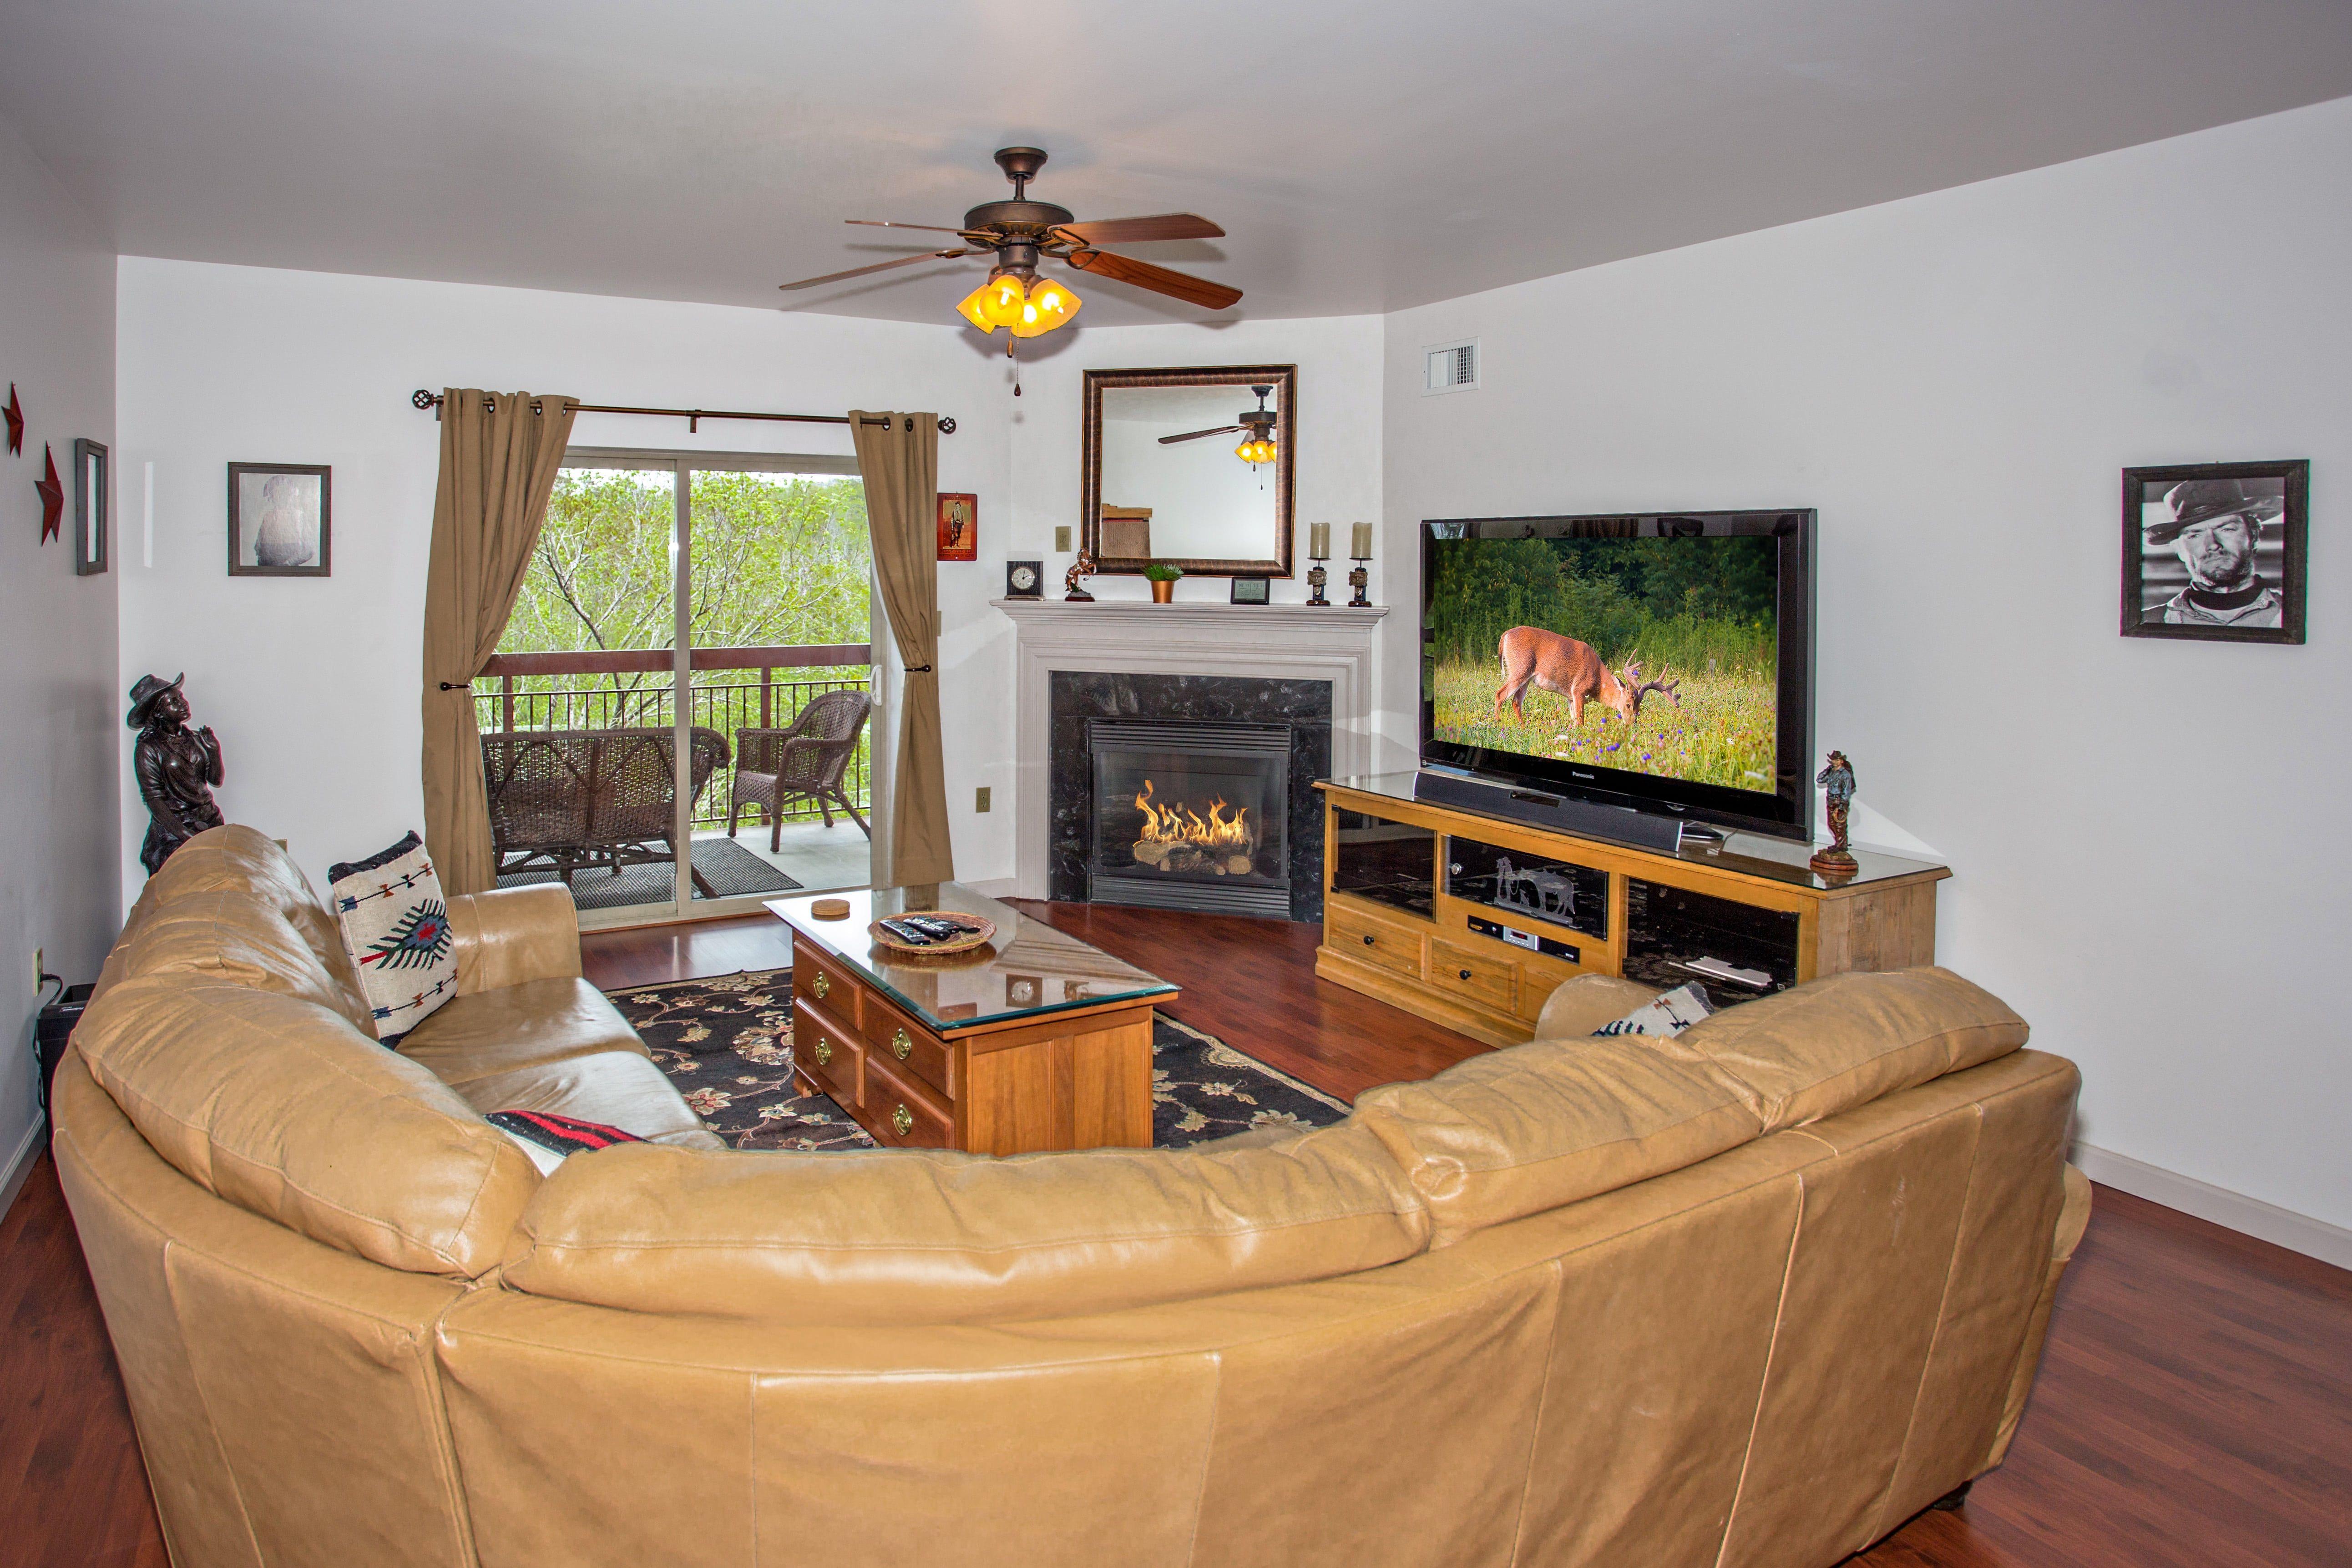 Cedar Lodge Has 2 3 Bedroom Condos In Pigeon Forge King Bedroom Luxurious Bedrooms 2 Bedroom Suites